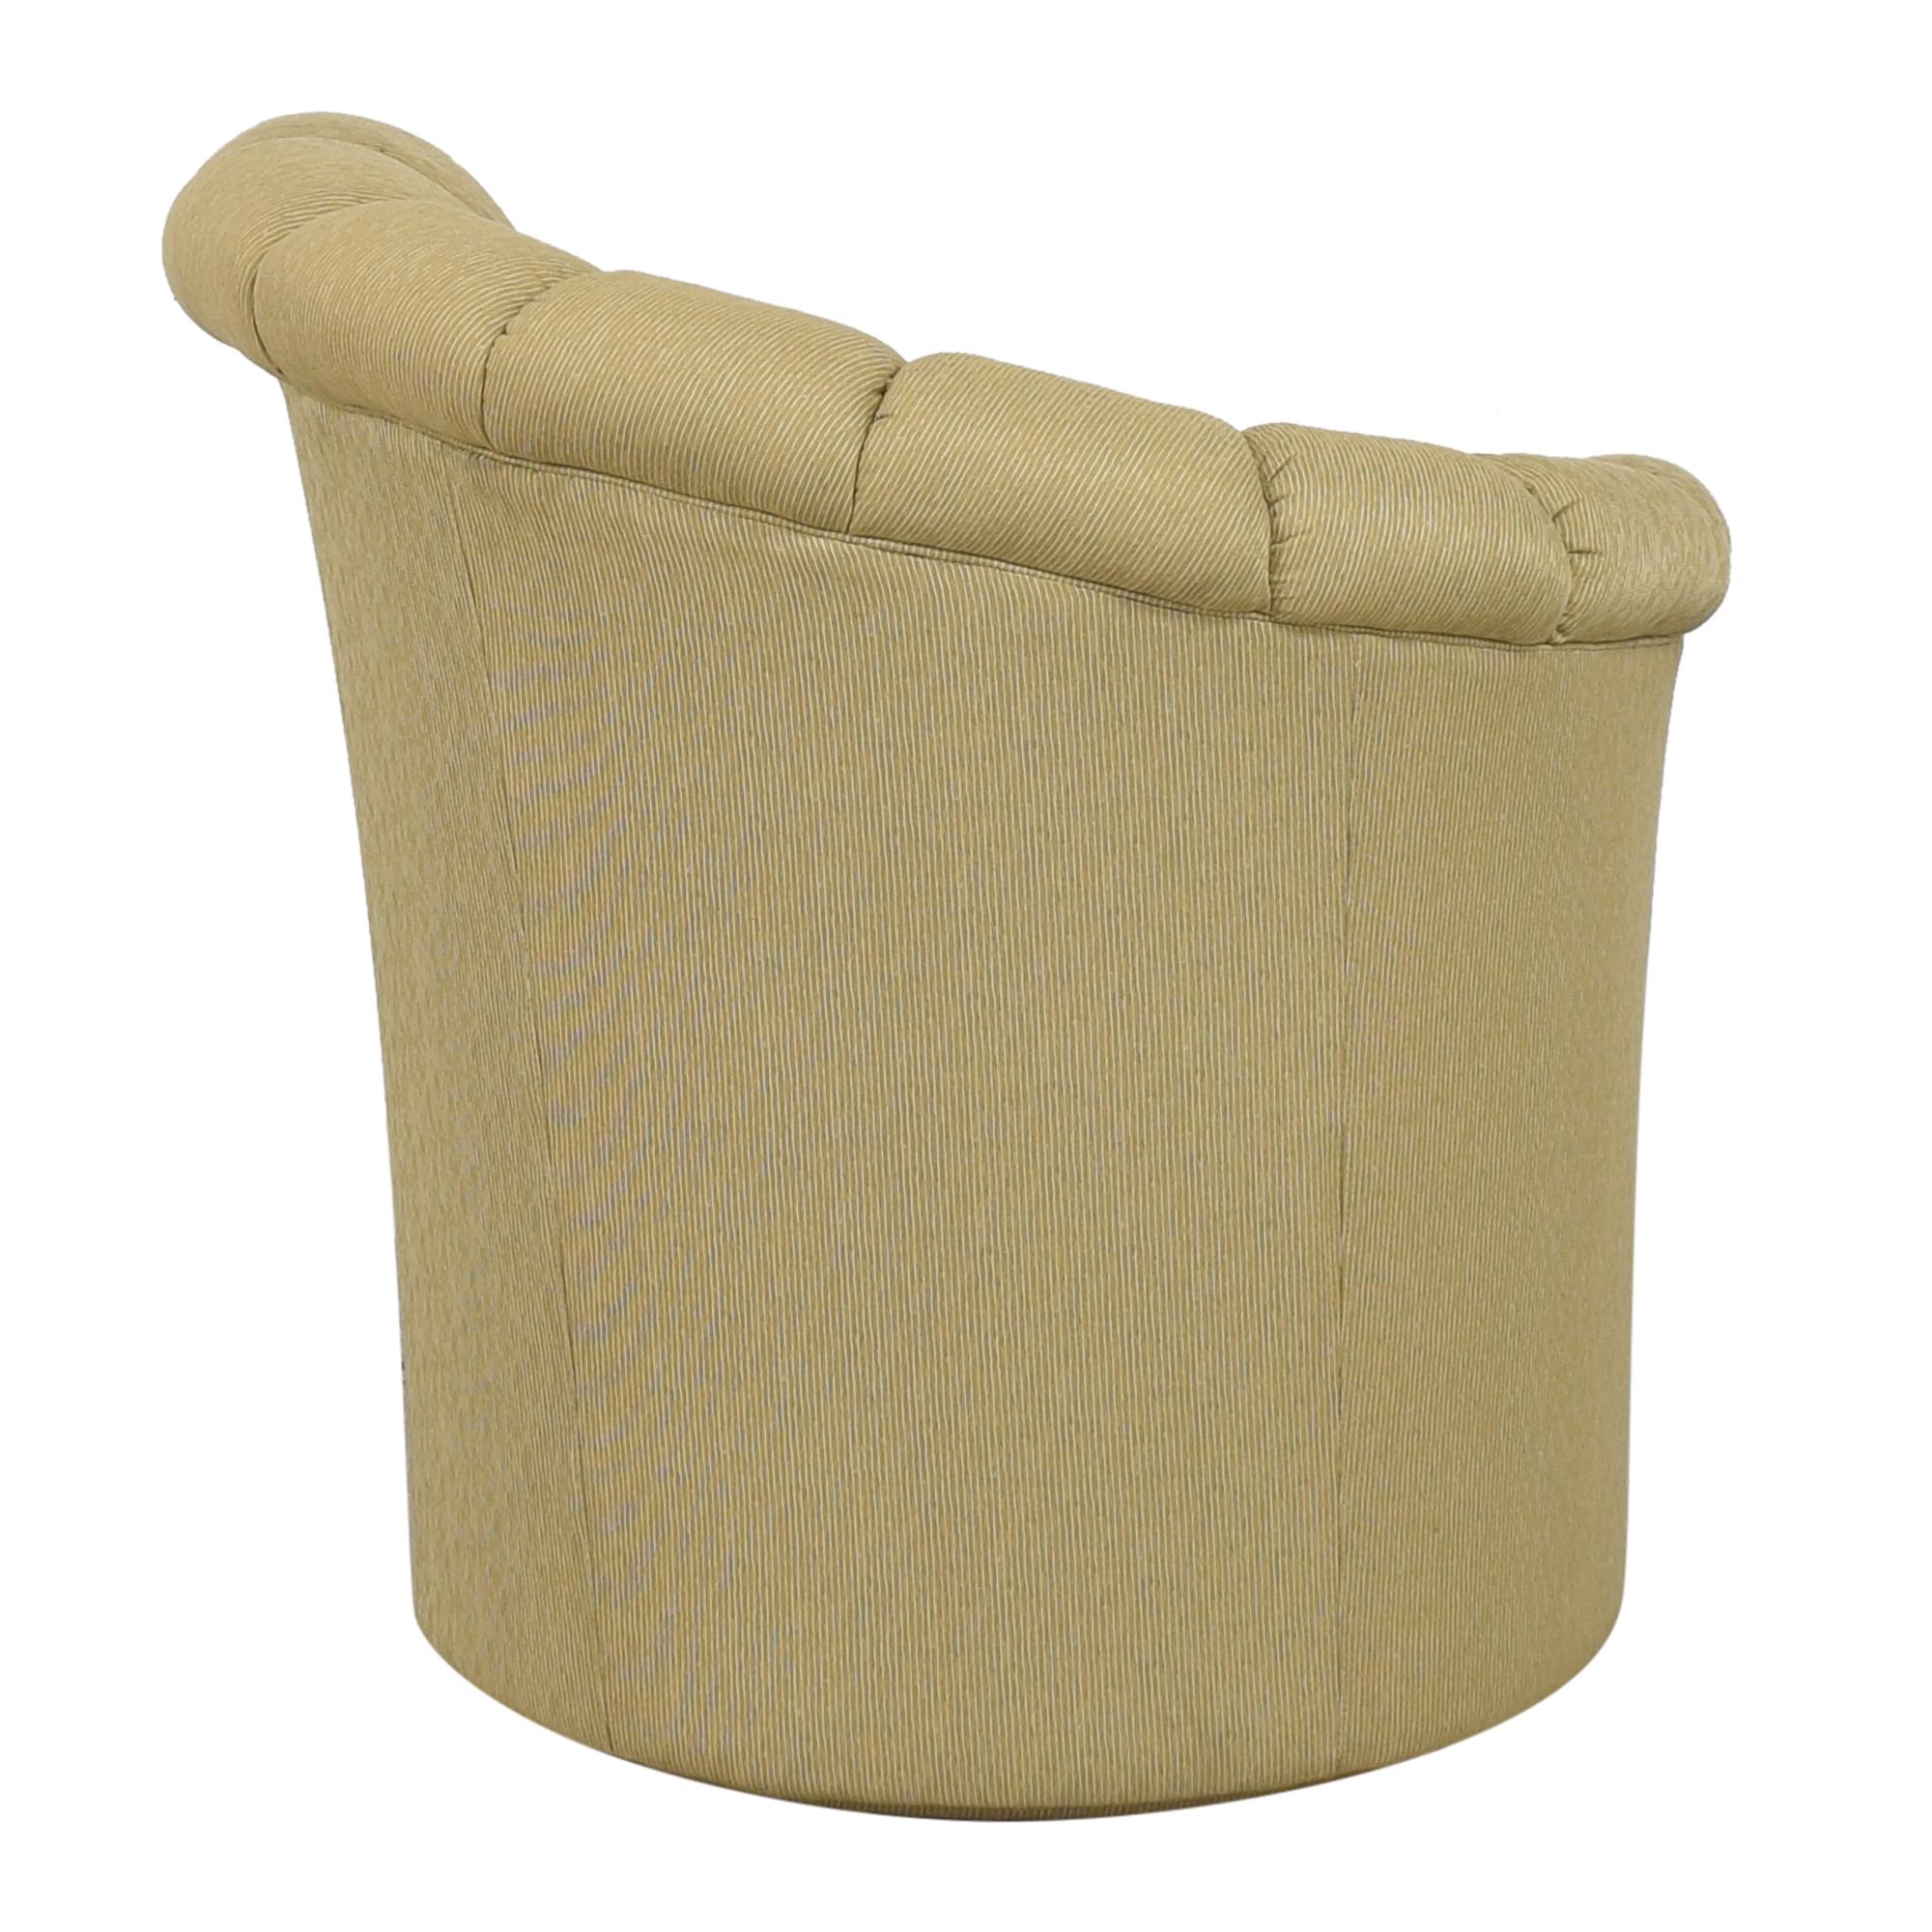 Thomasville Thomasville Starlet Left Arm Swivel Chair used